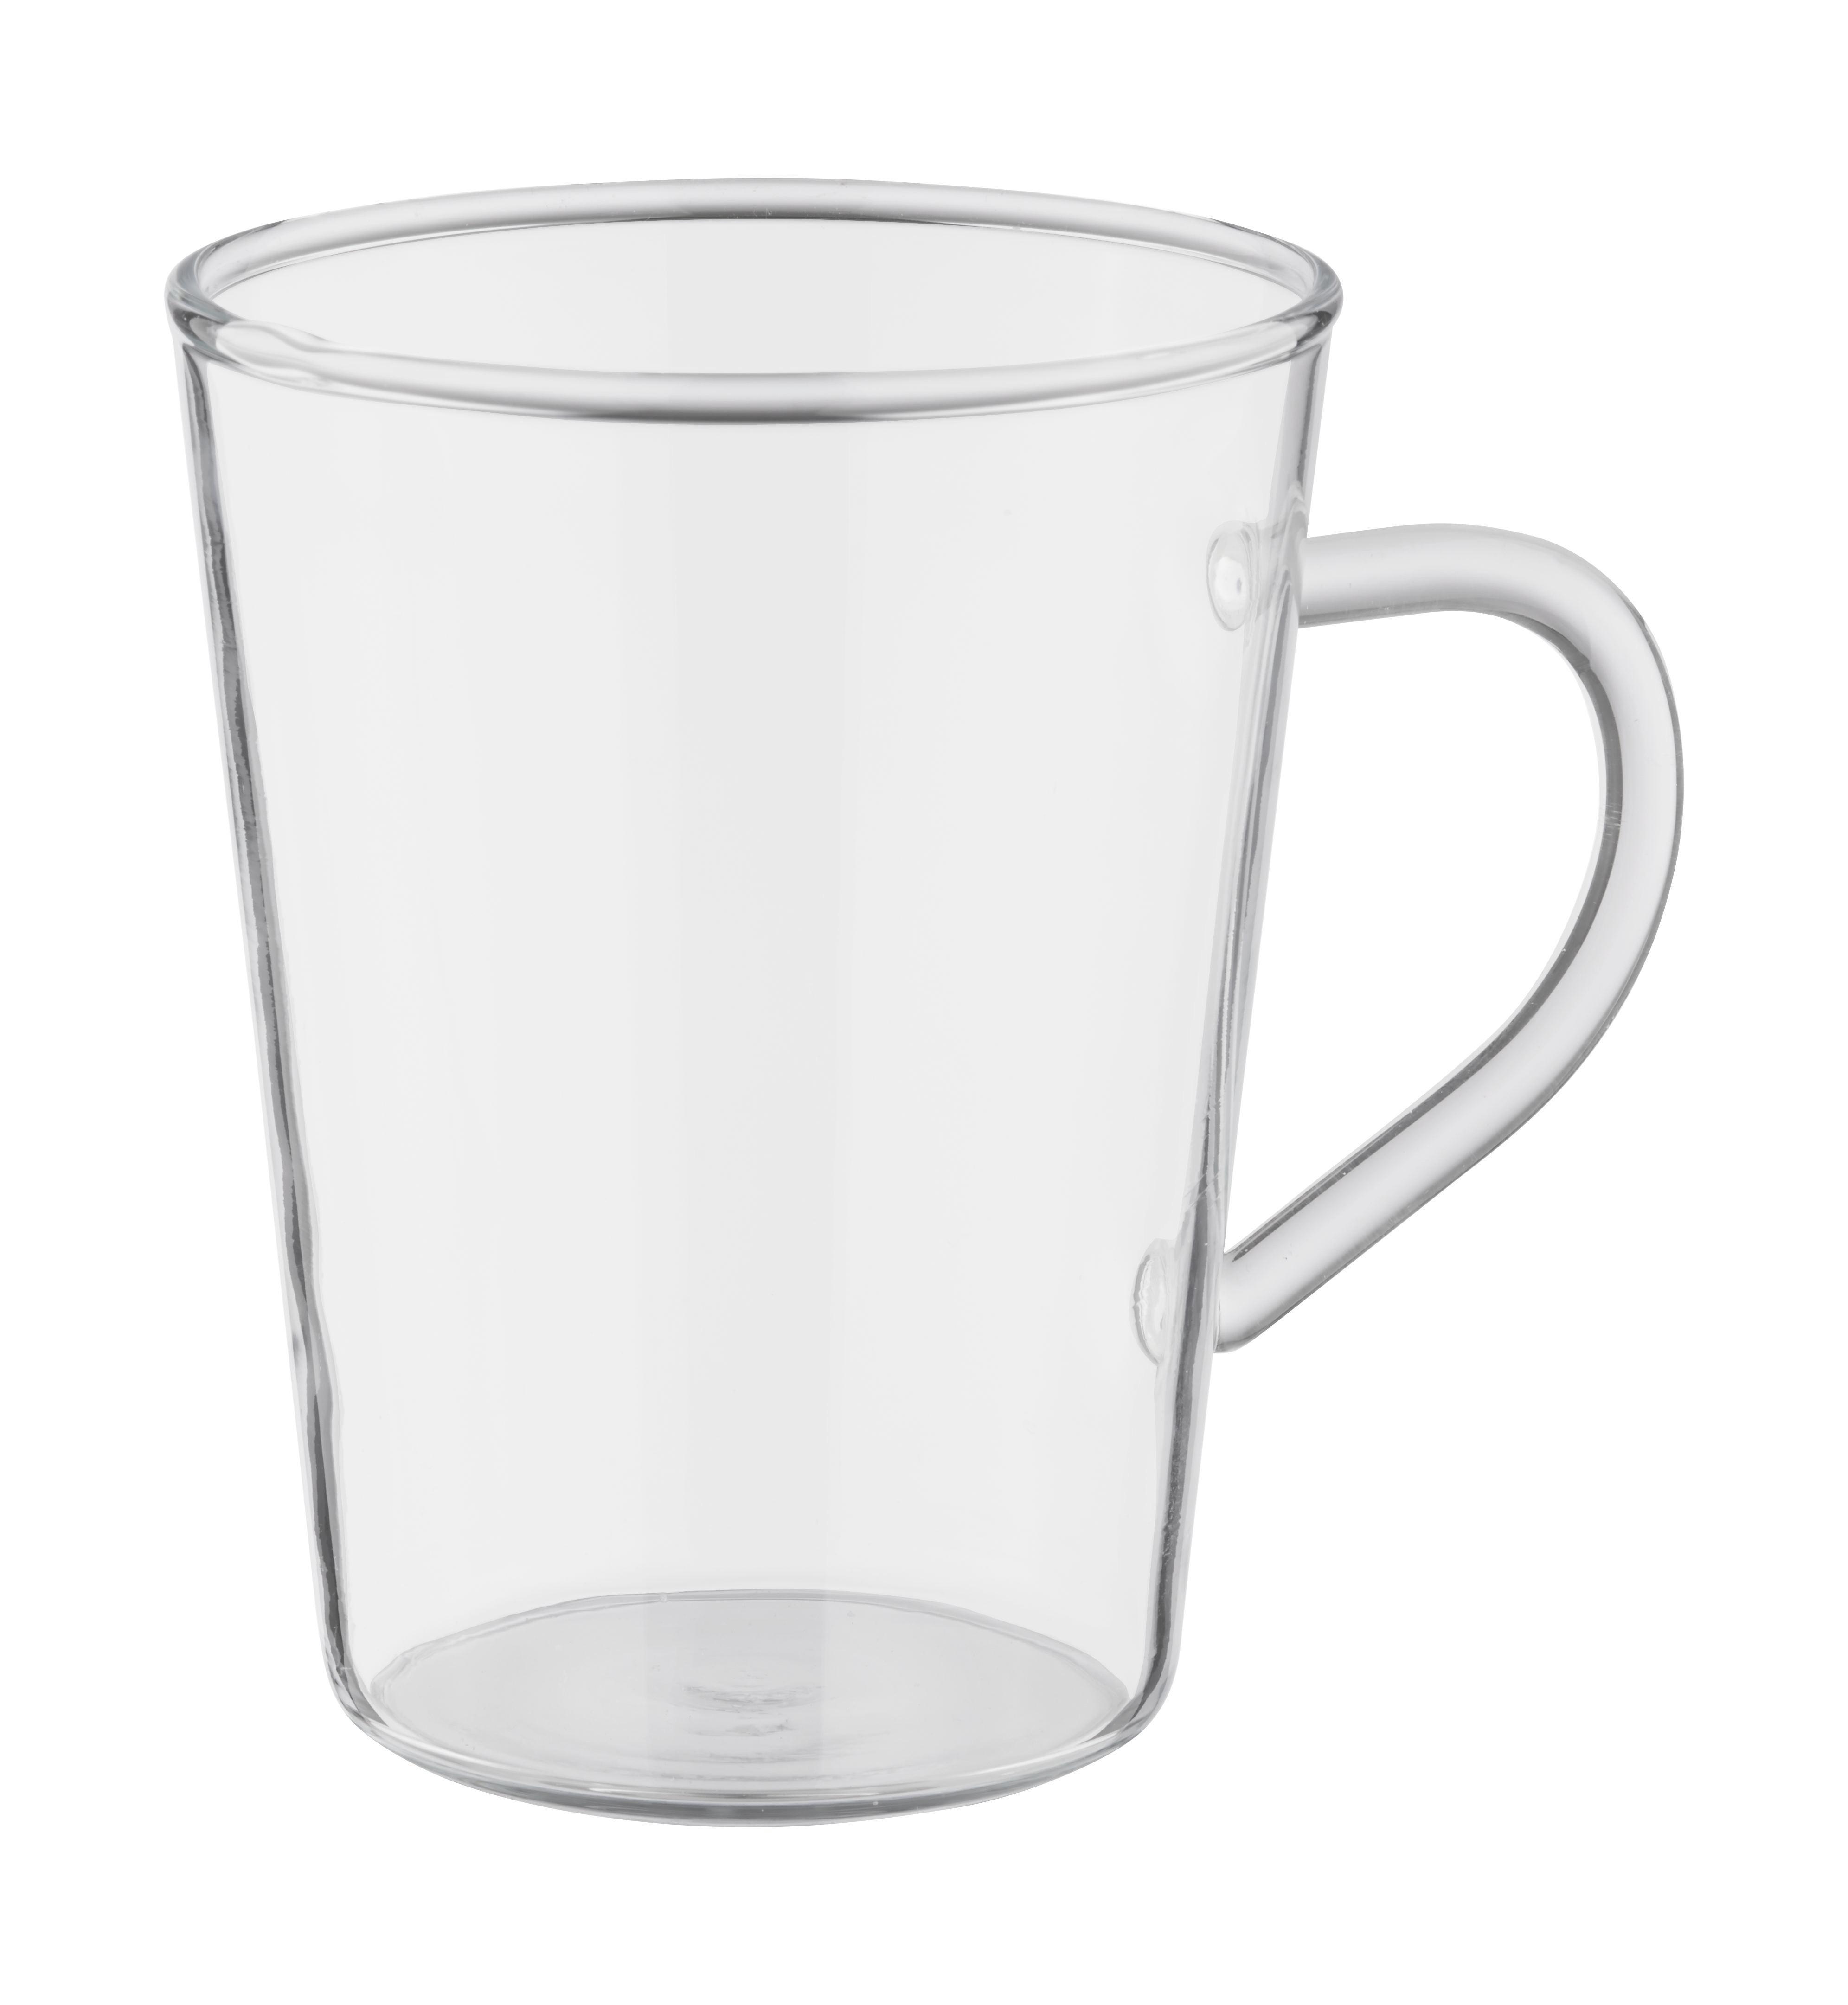 Teeglas 6er Pack, ca. 250ml - Glas - MÖMAX modern living